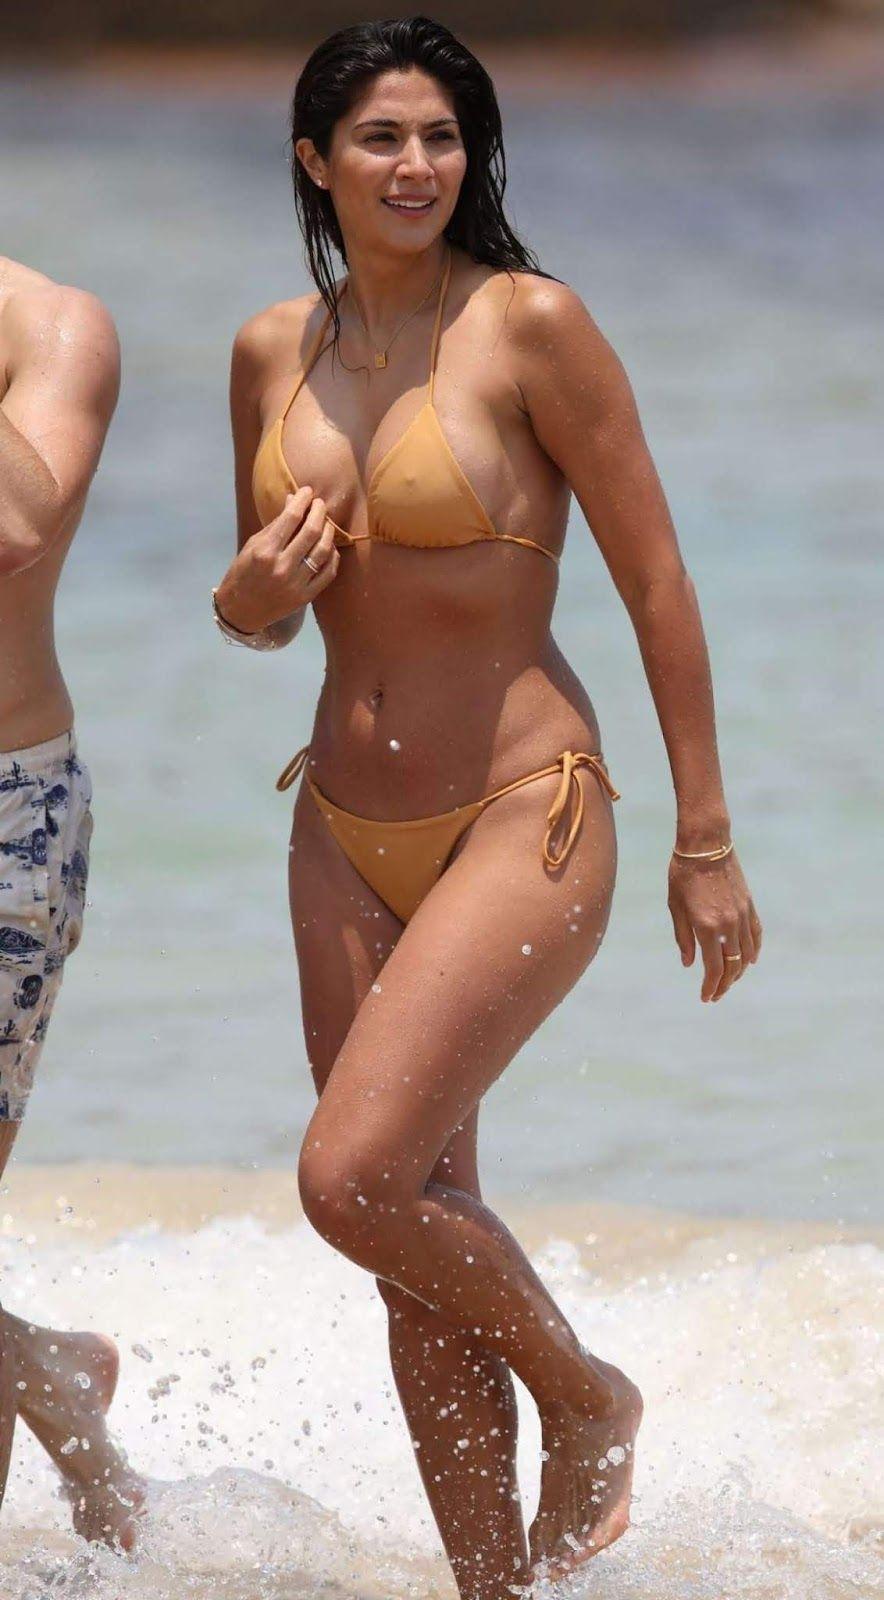 Pin By Scott S On Hot In 2021 Bikinis Bondi Beach Orange Bikini